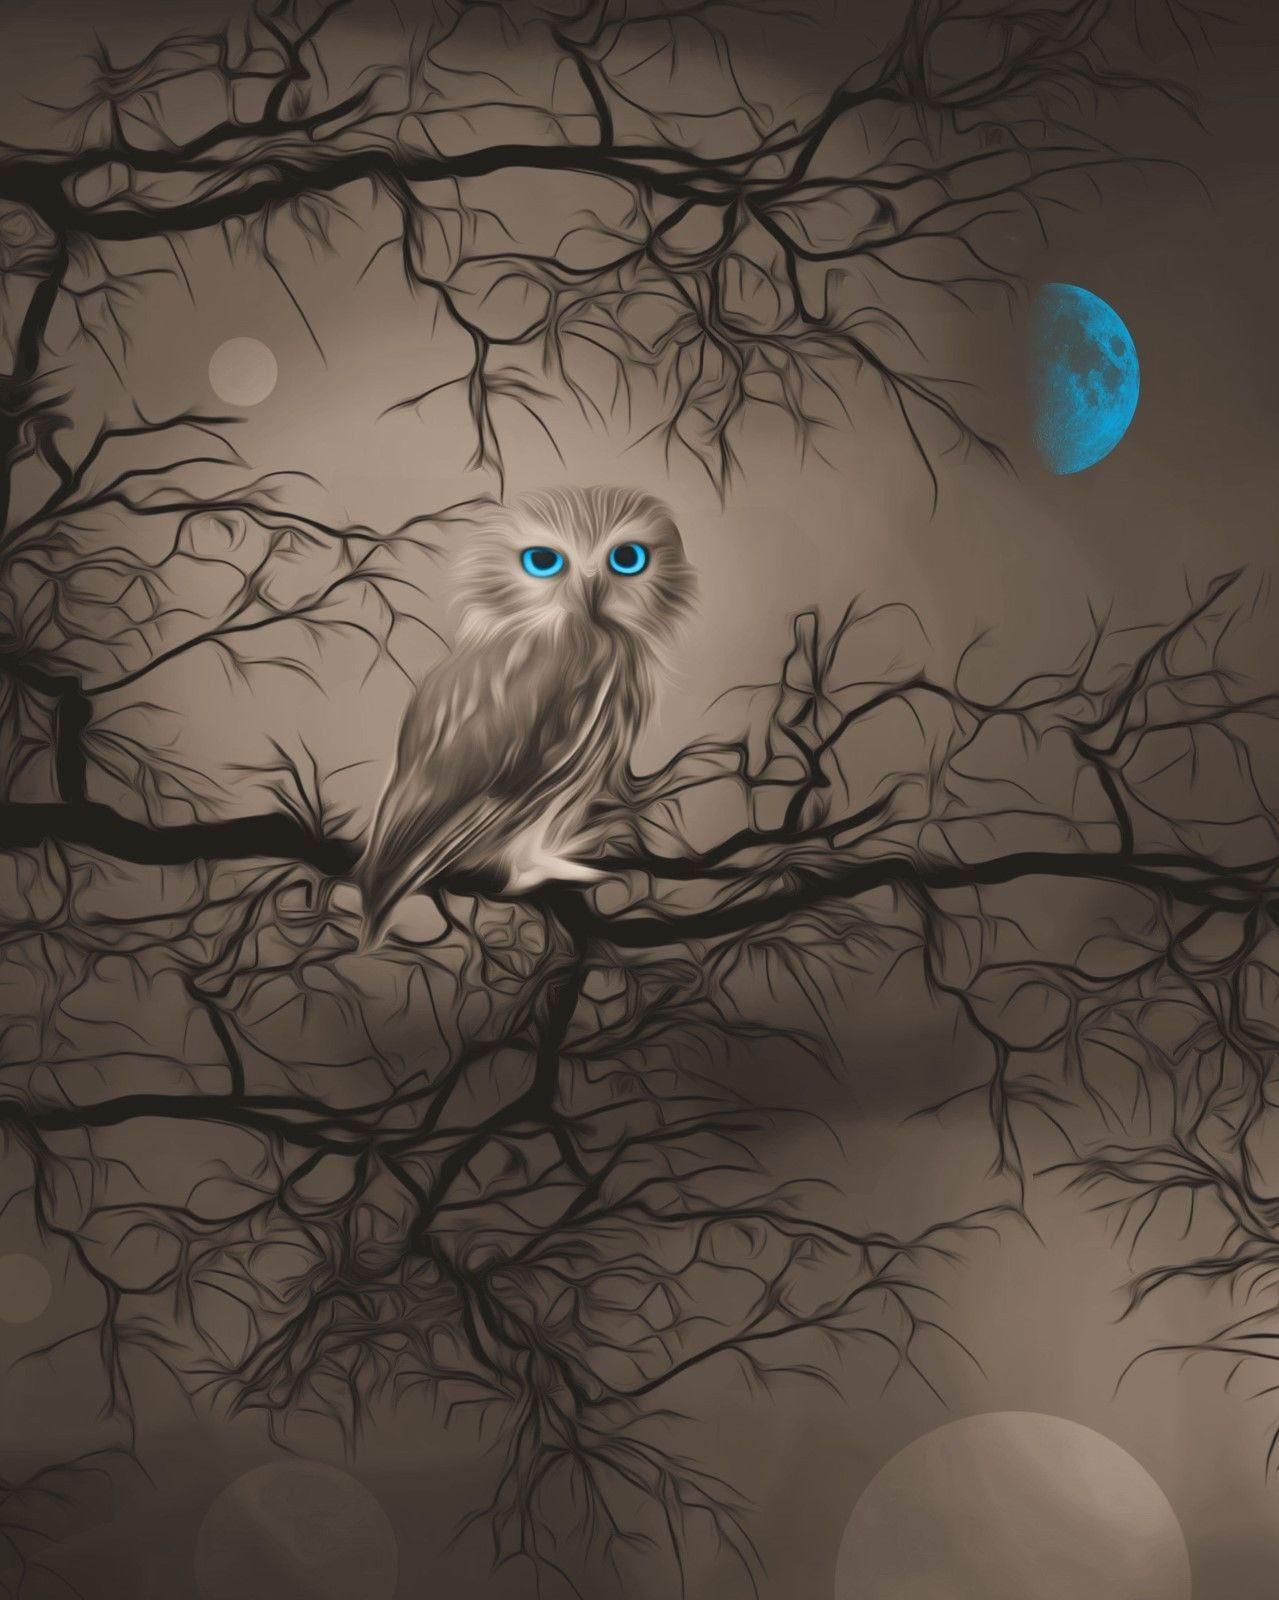 Brown blue moon owl decor modern bedroom home decor wall art matted